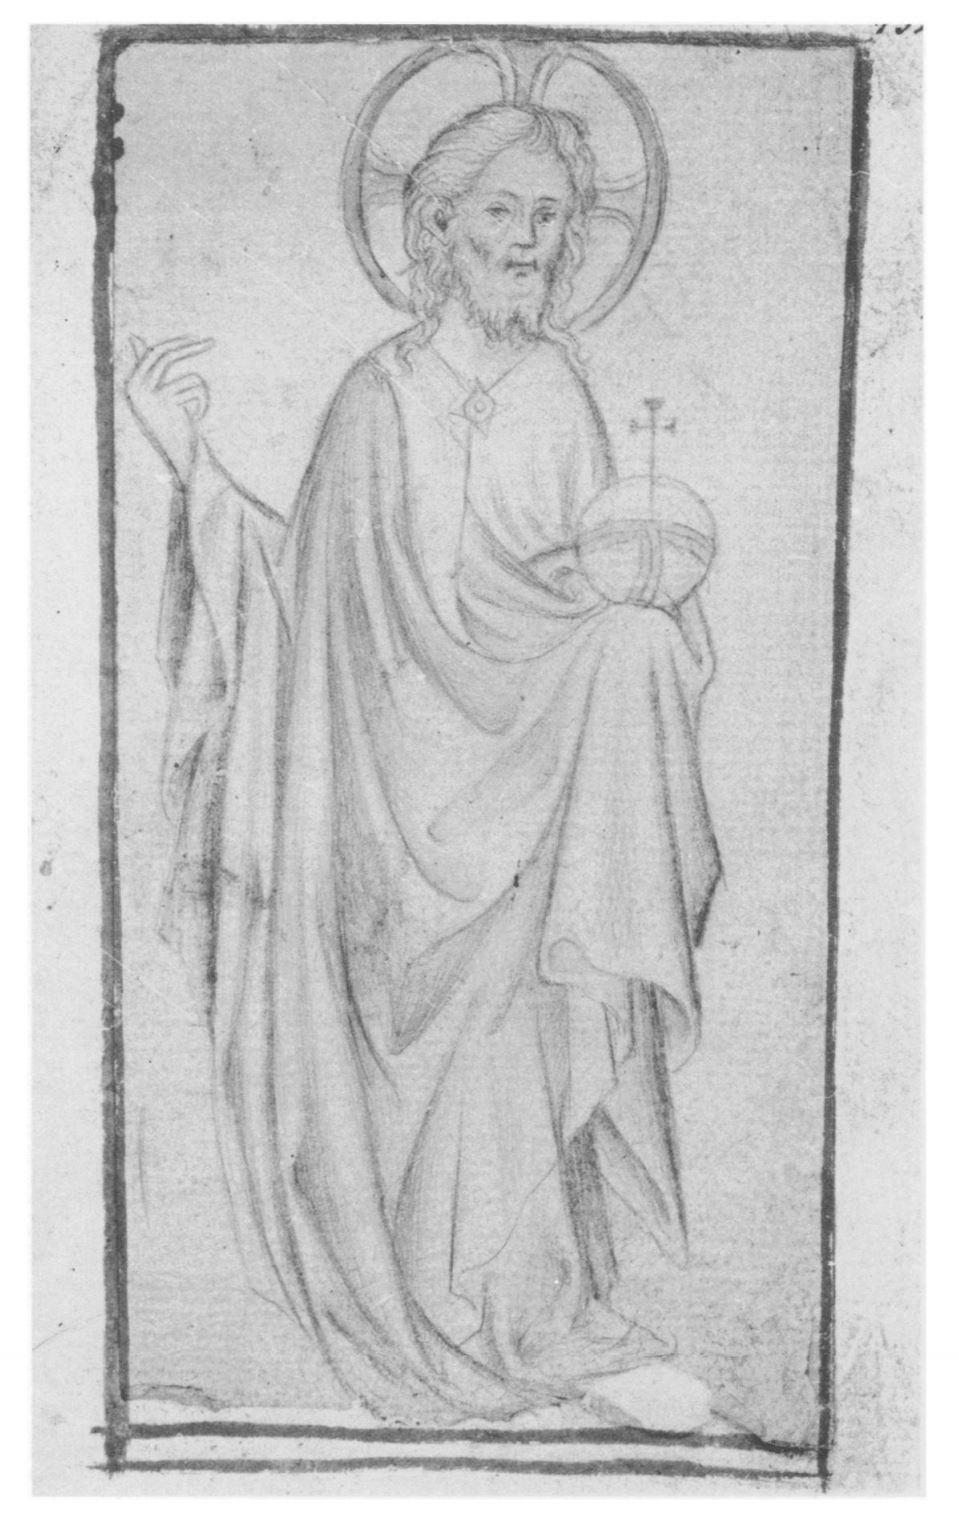 Salvator Mundi 1380-1410 Wiesbaden Hauptstaatsarchiv MS 3004 B10 fol 132r